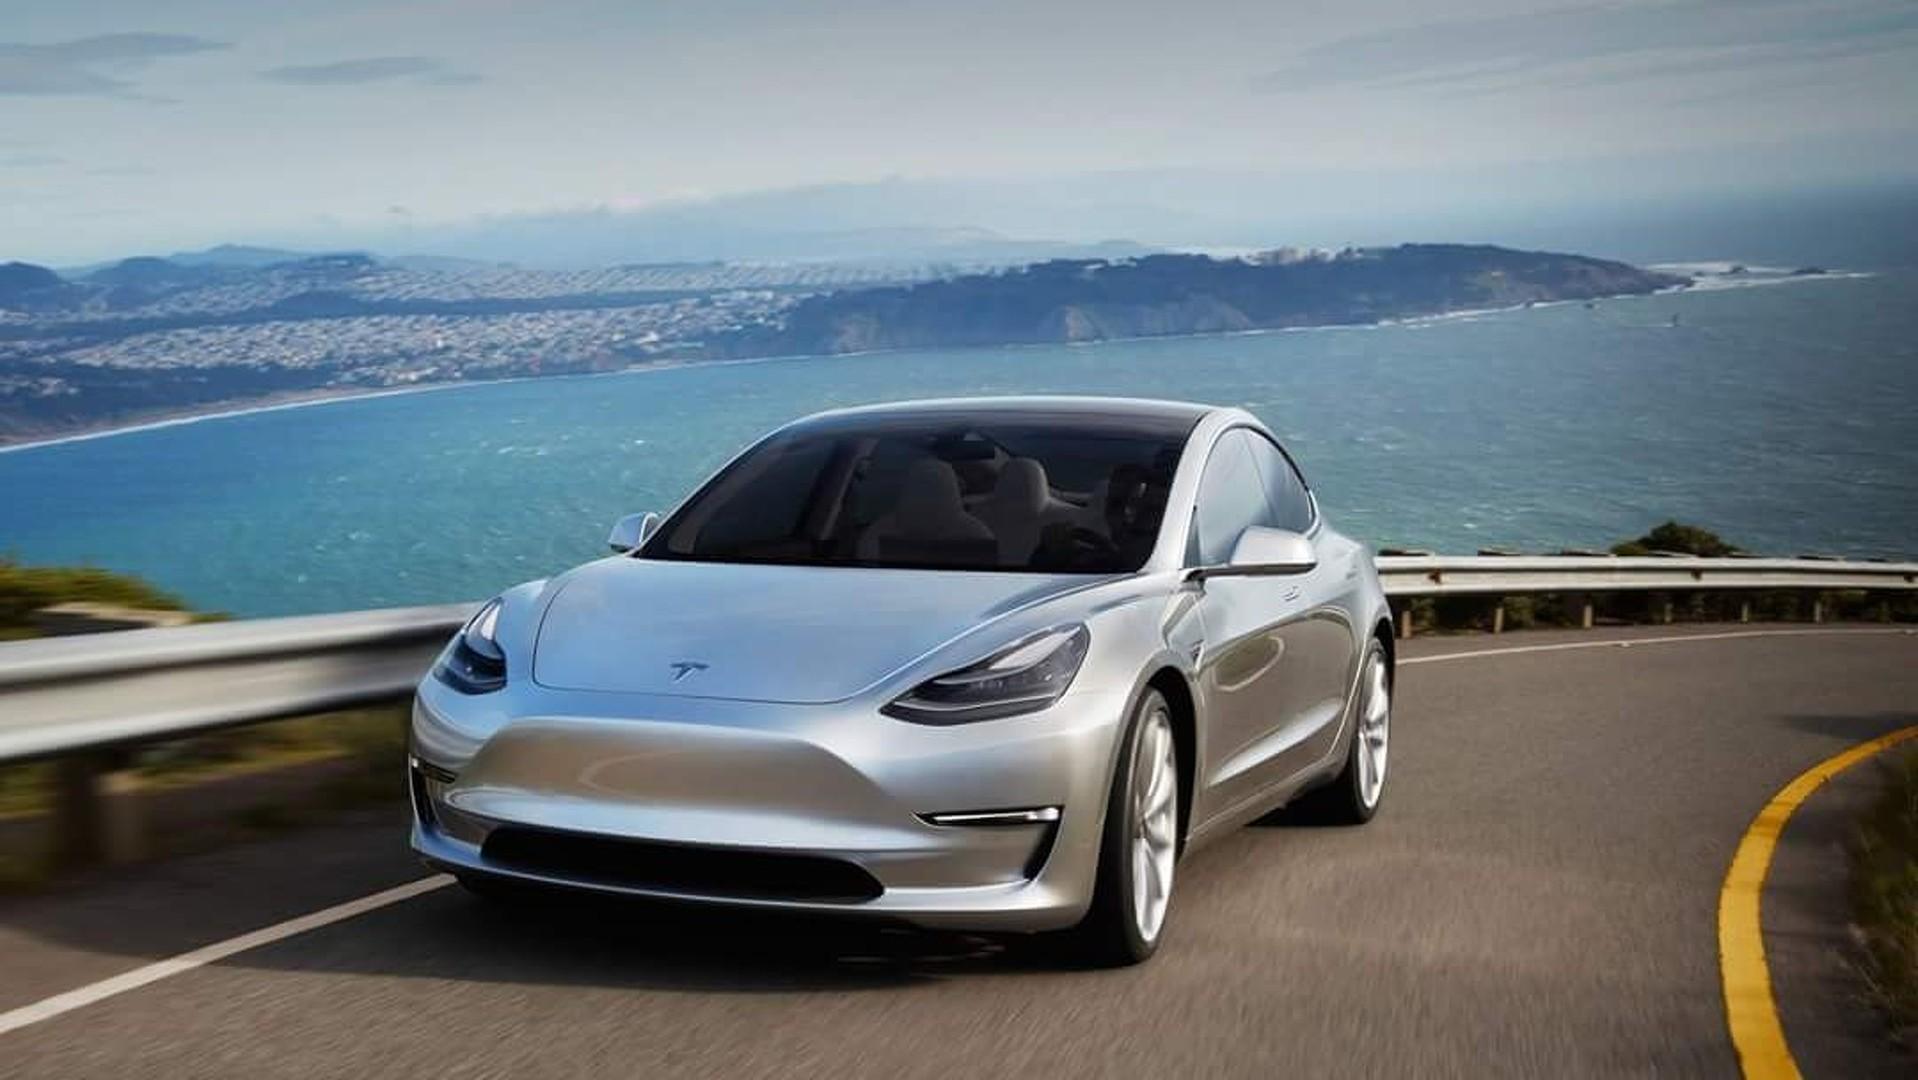 New Tesla Model 3 beauty photos surface